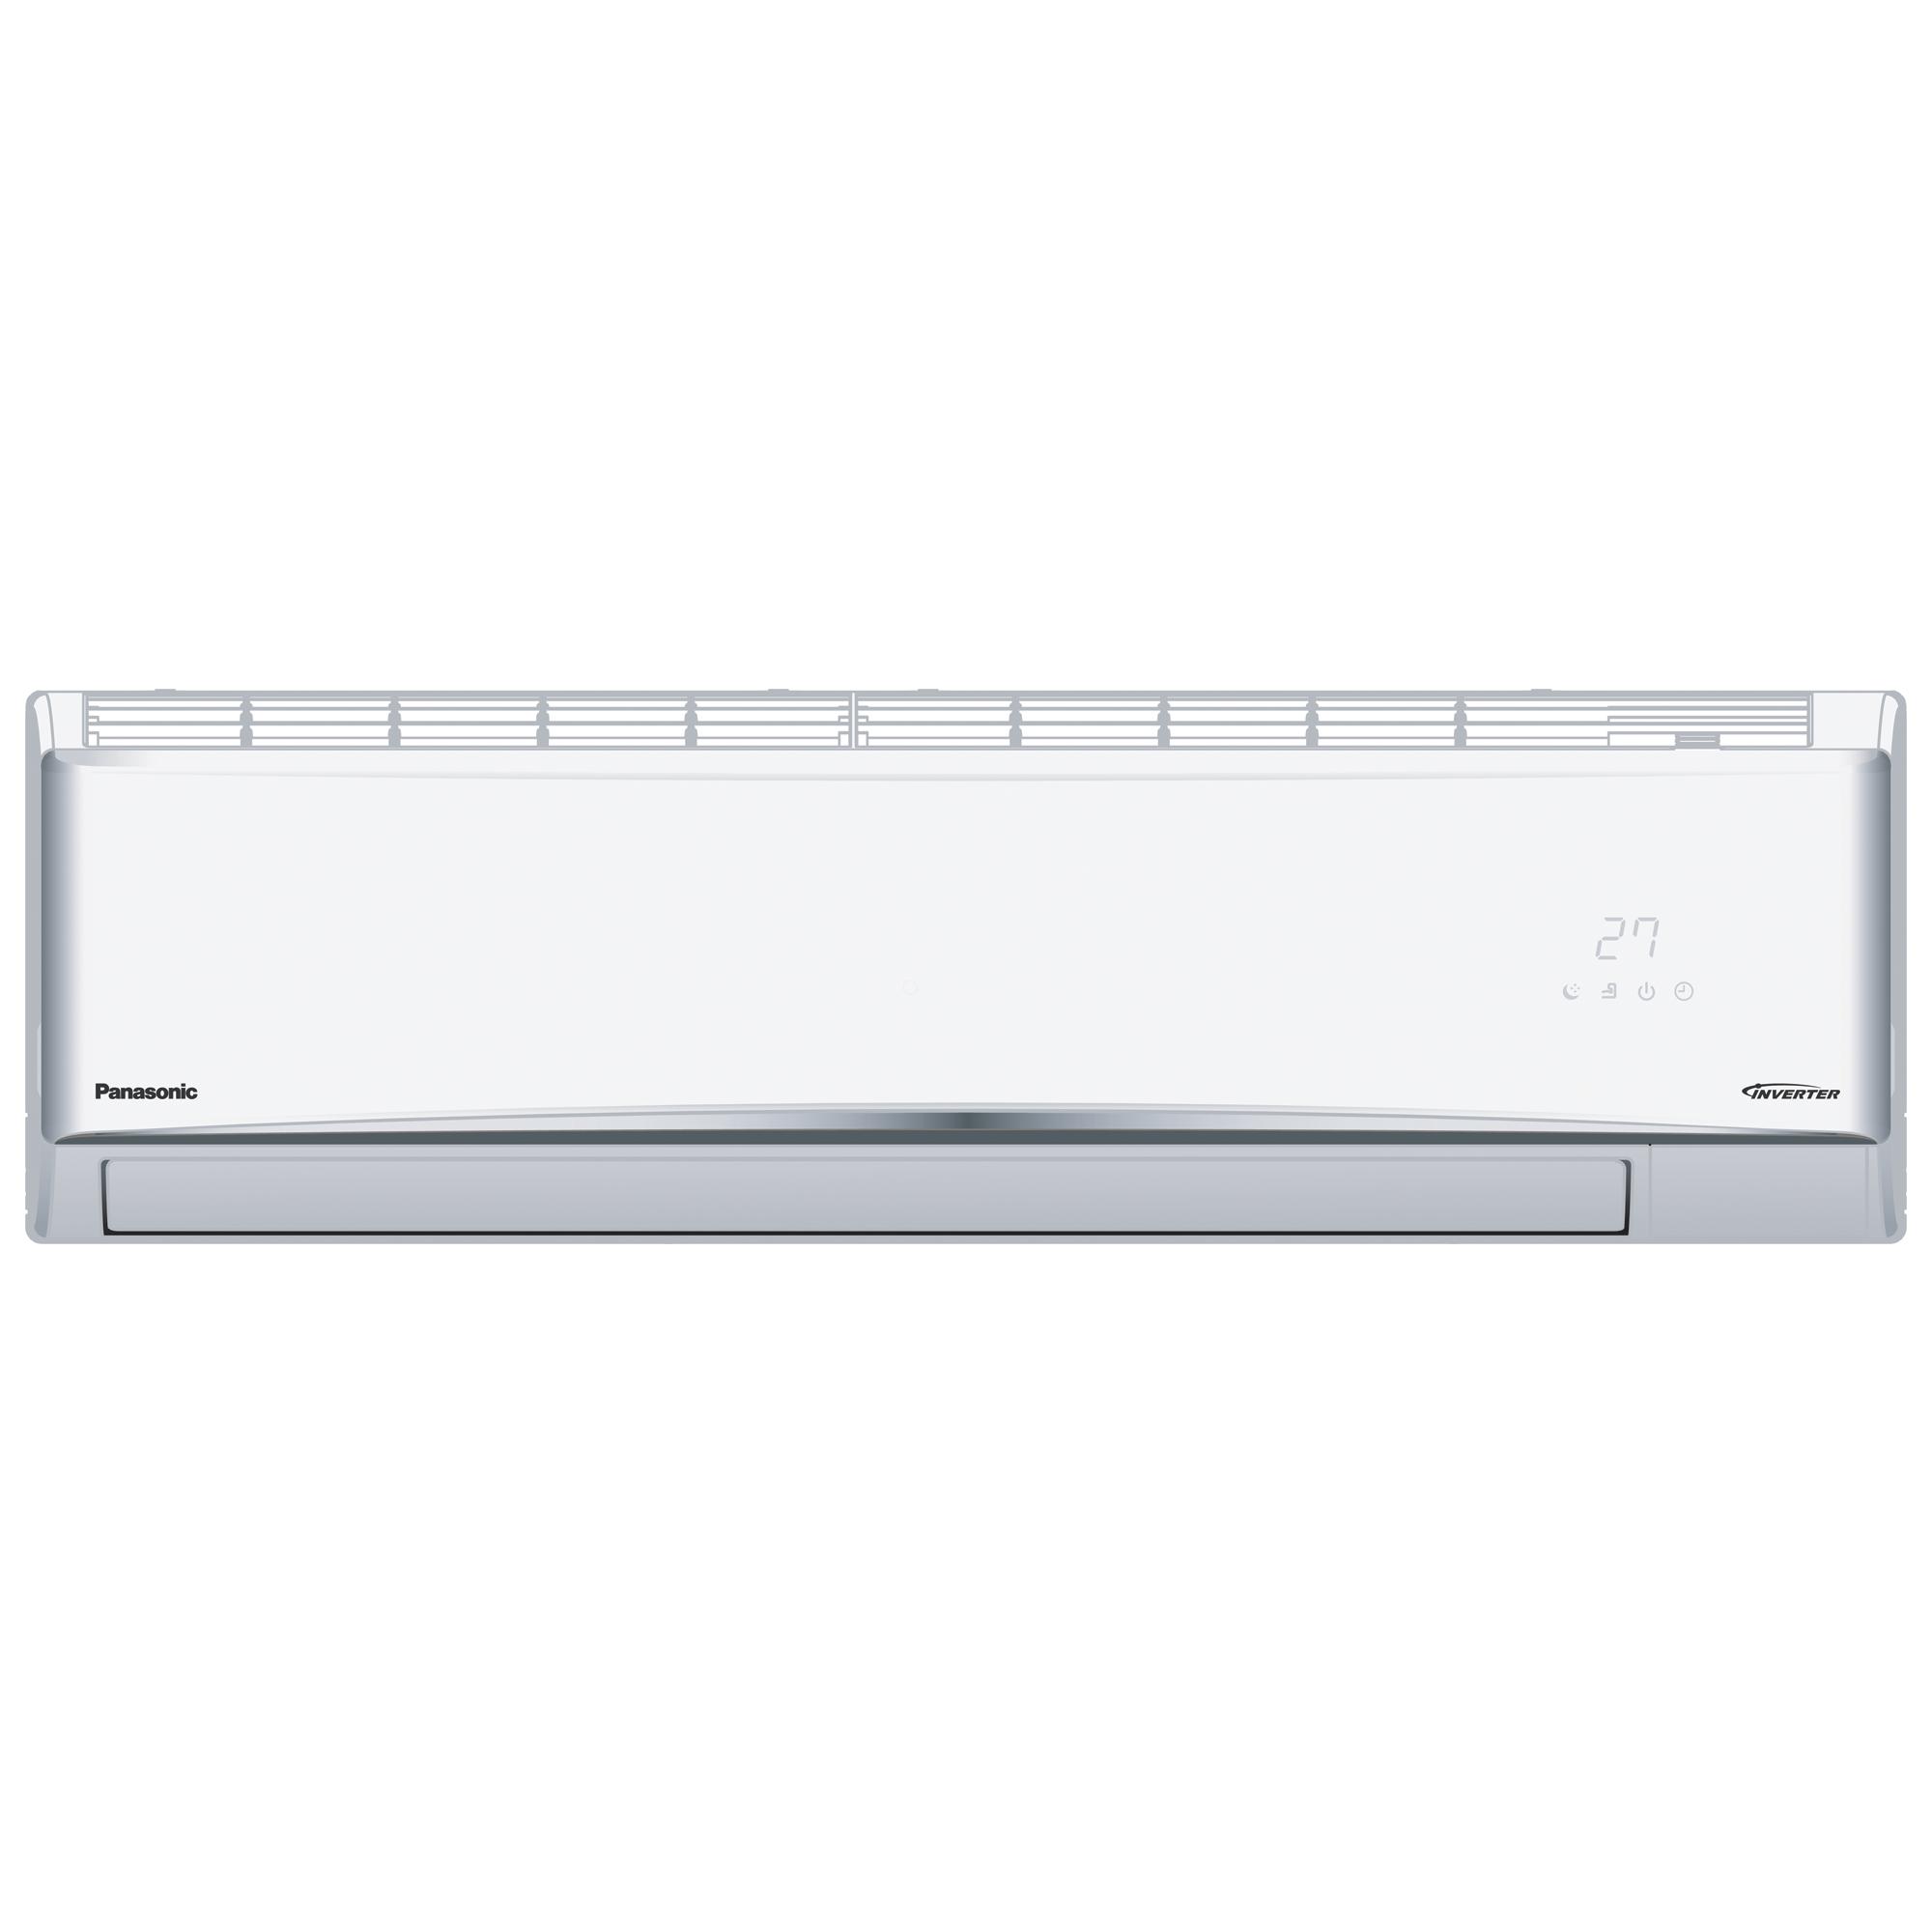 Panasonic ZU 1.5 Ton 5 Star Inverter Split AC (Air Purification Filter, Copper Condenser, CS/CU-ZU18XKYF, White)_1